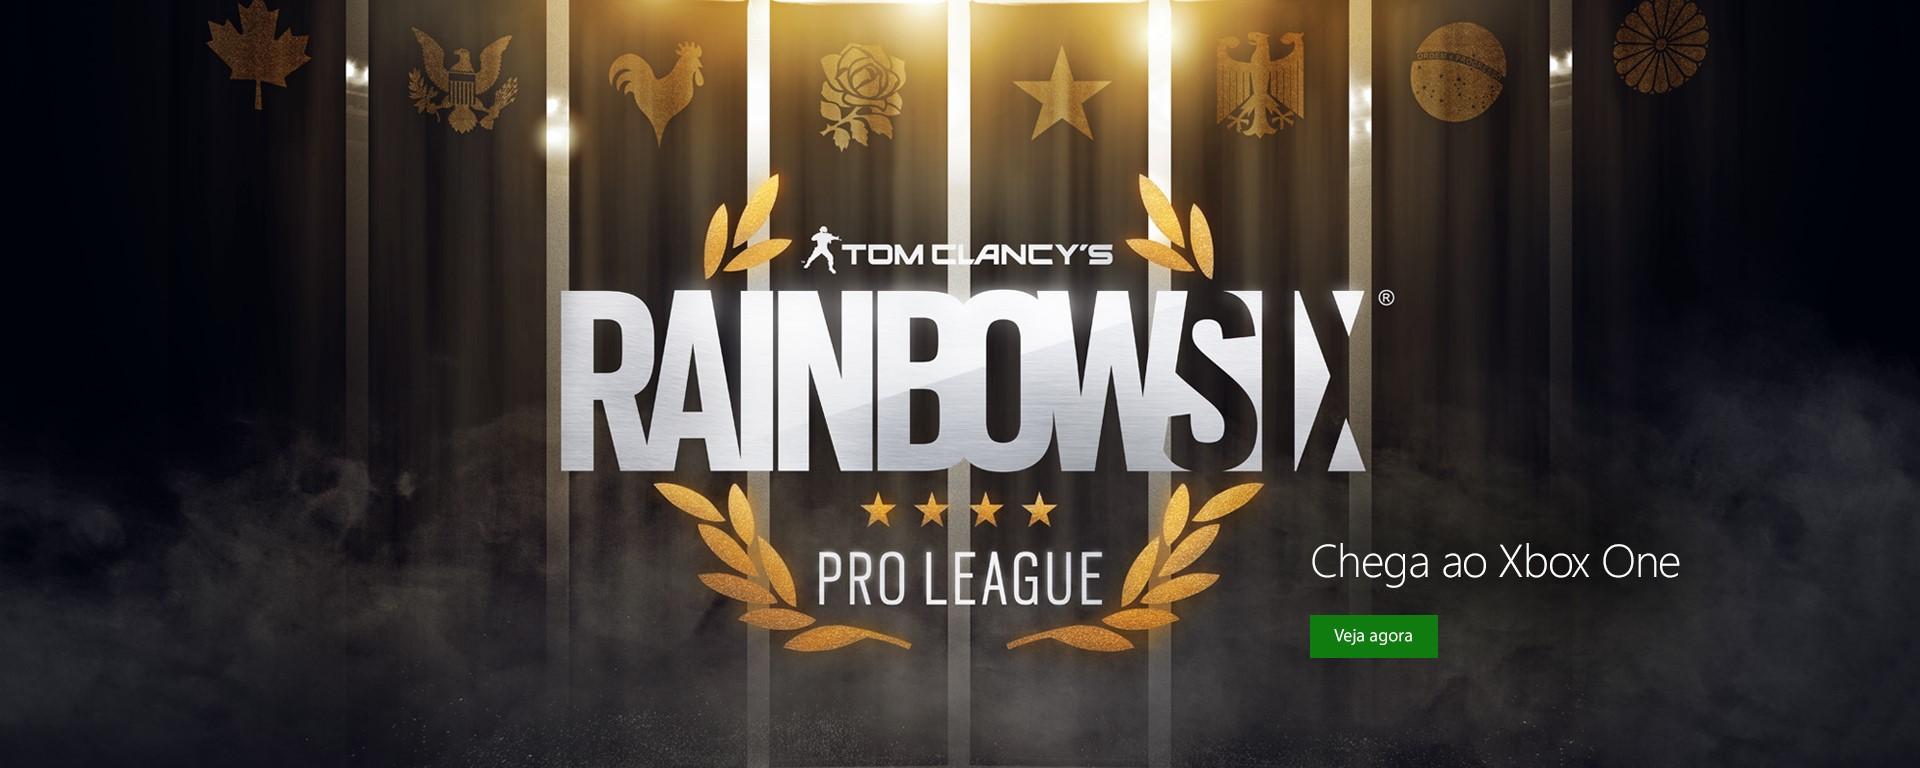 rainbow 6 esports